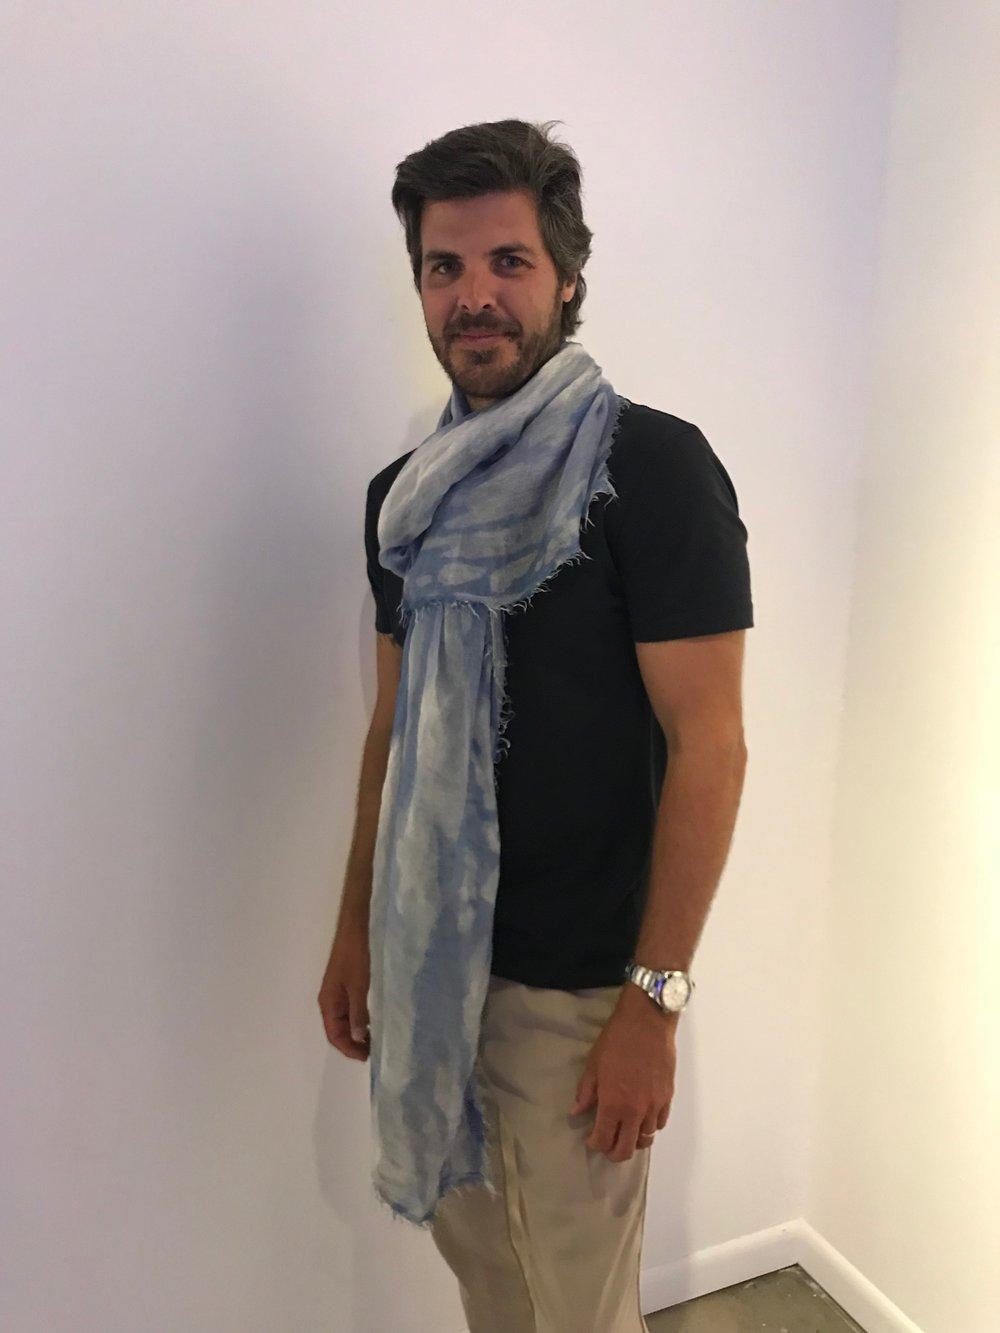 Eduardo in Miami